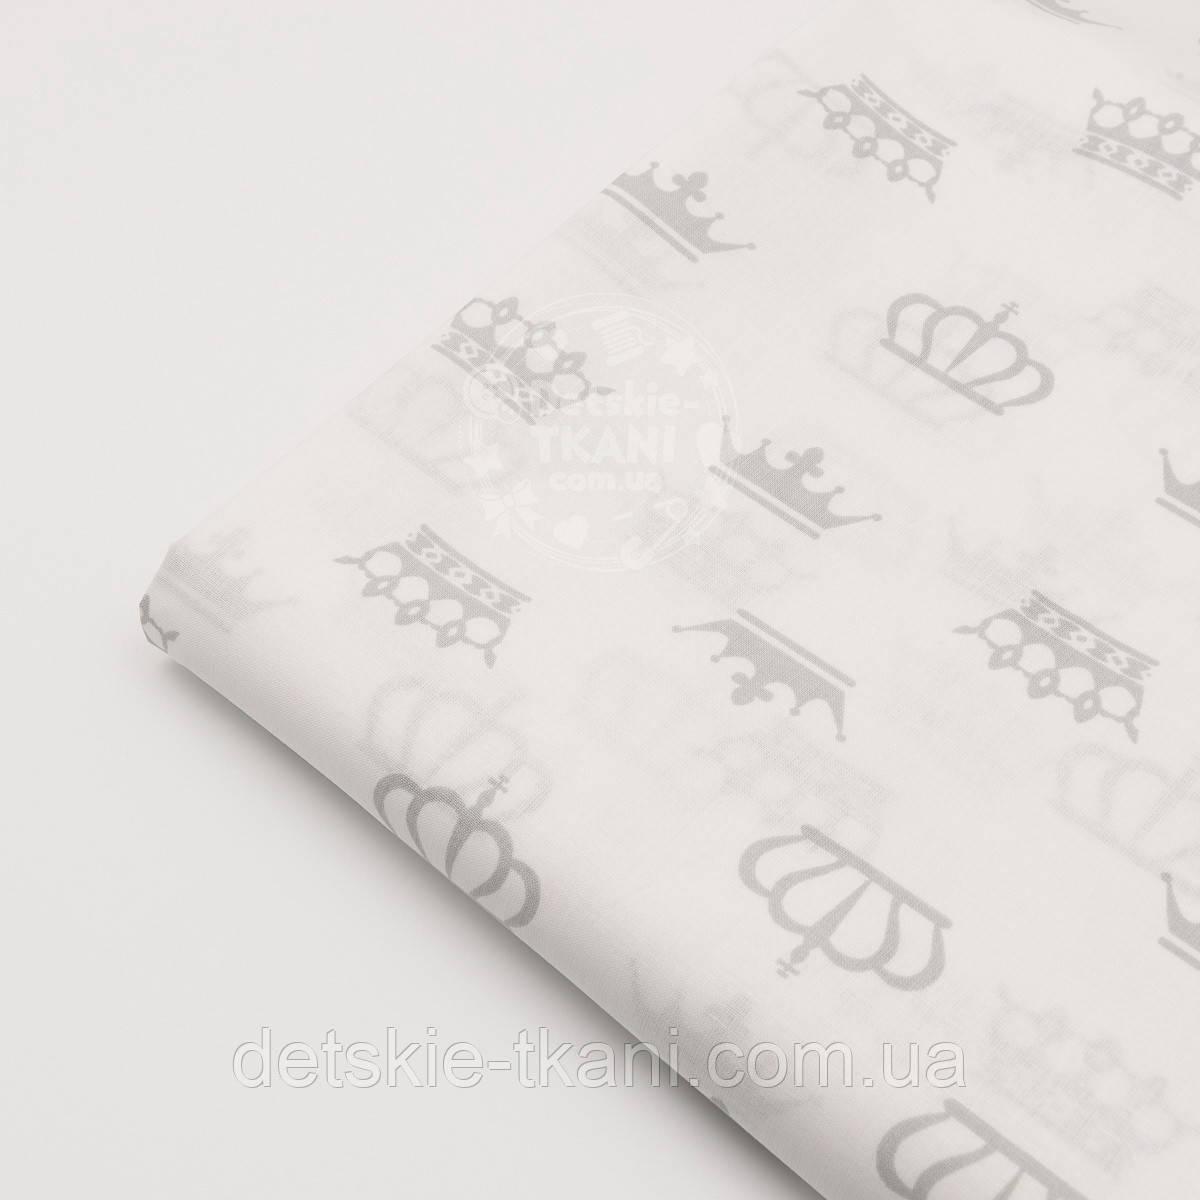 Отрез ткани №179а с серыми коронами на белом фоне размер 60*160